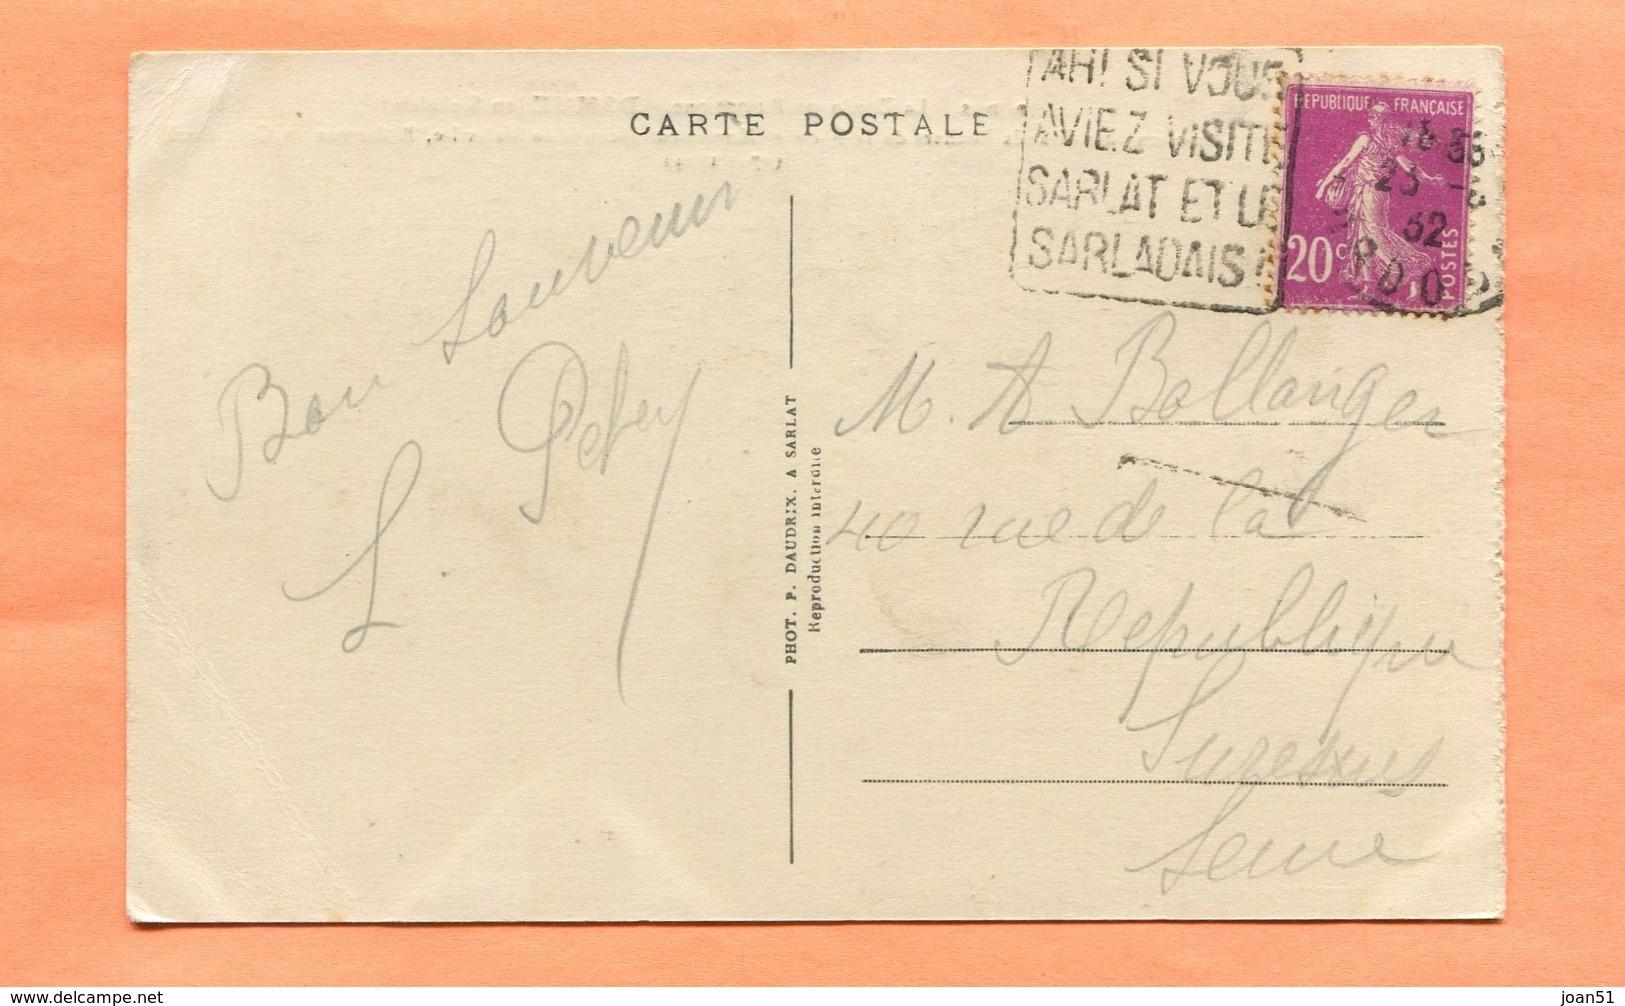 M2  DAGUIN  TEXTE A GAUCHE  SARLAT SUR SEMEUSE LILAS 20 C 1932 - Mechanical Postmarks (Advertisement)